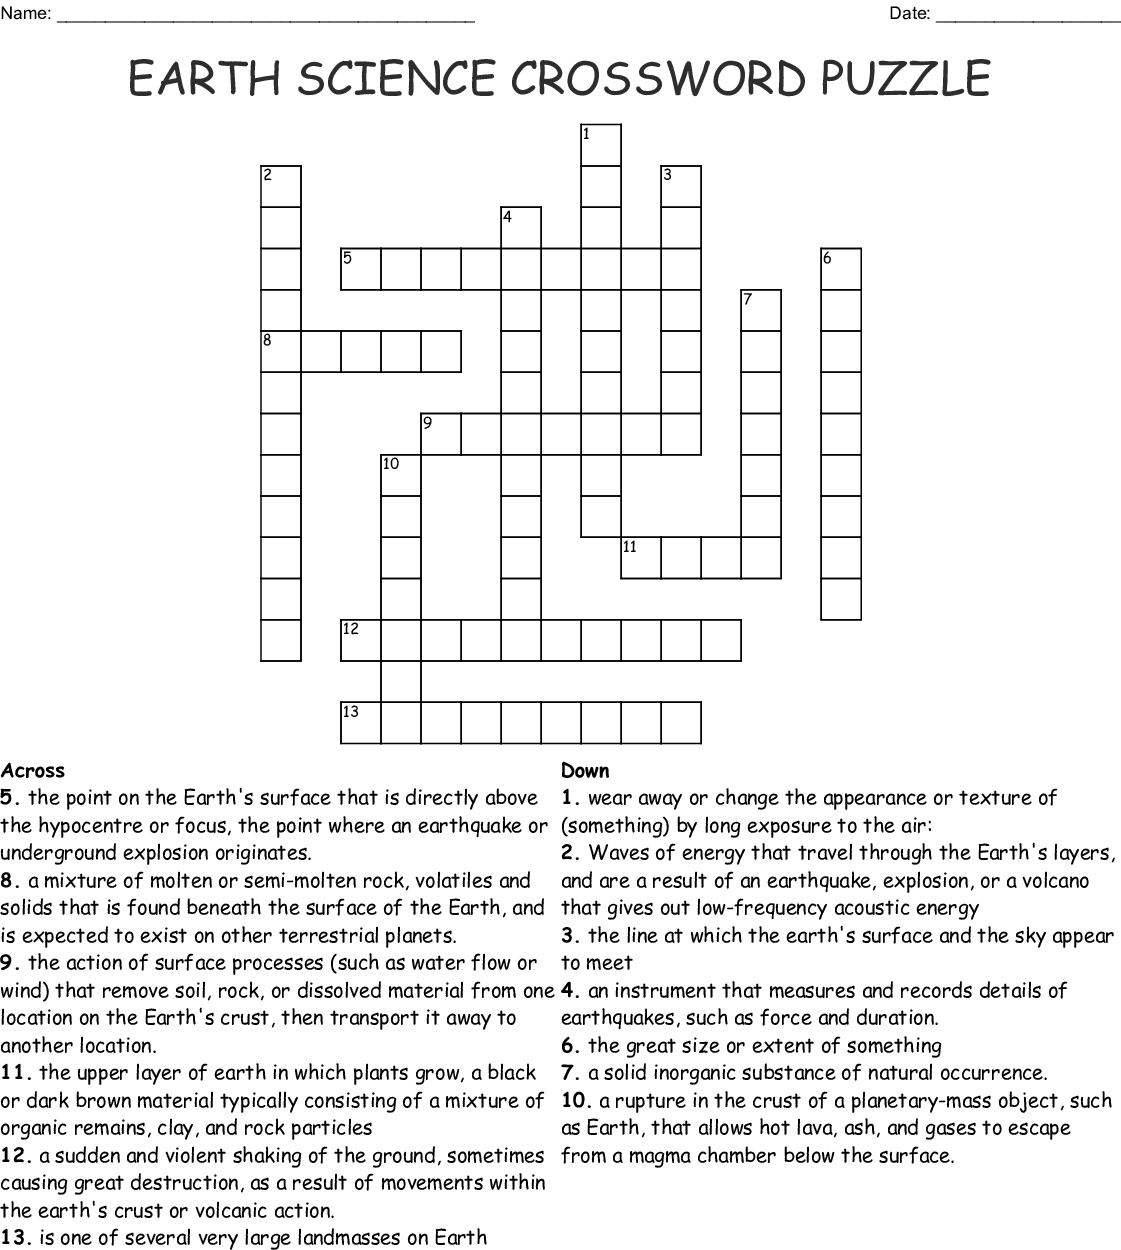 Earth Science Crossword Puzzle Crossword - Wordmint - Science Crossword Puzzles Printable With Answers